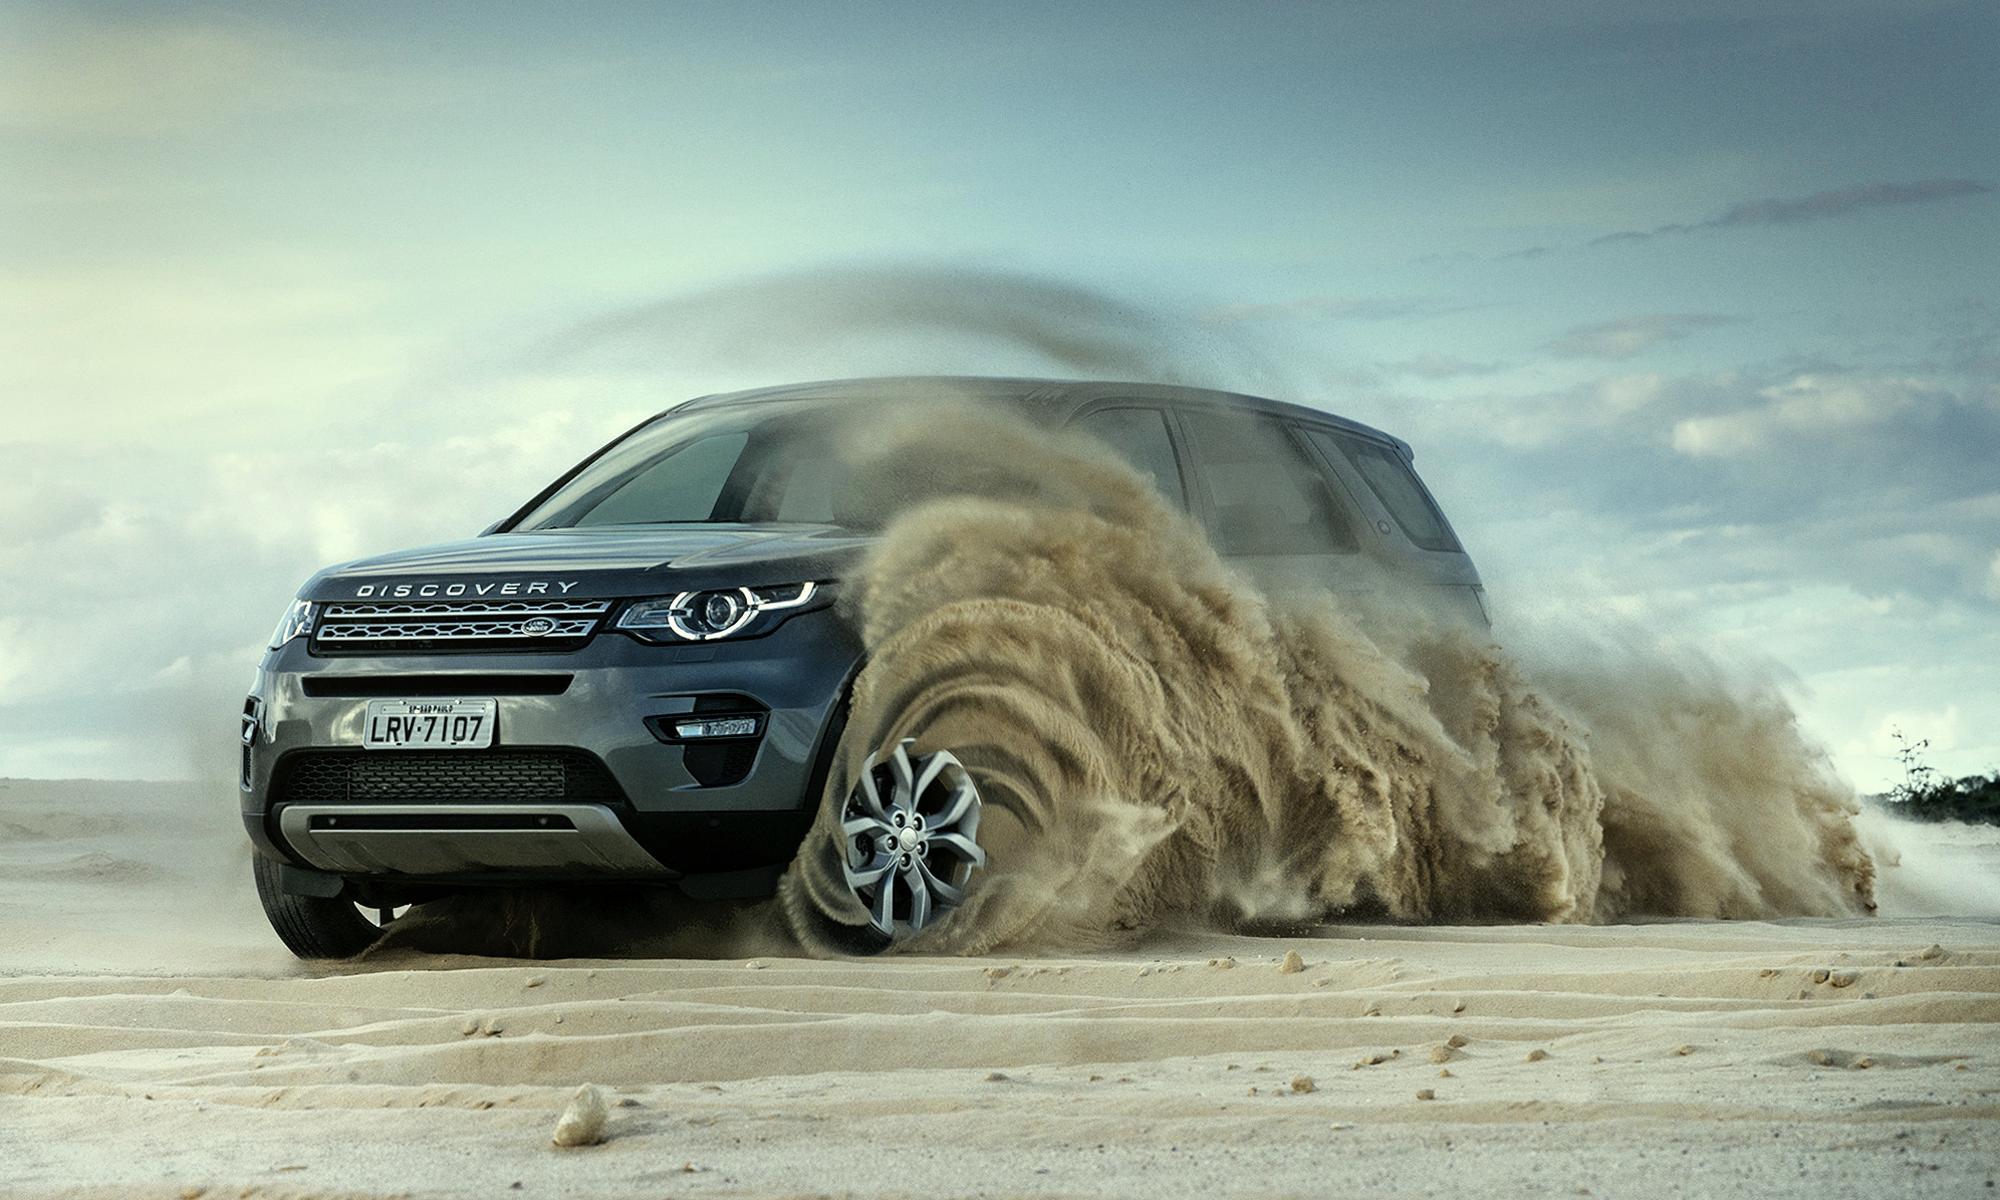 Wunderman | Land Rover